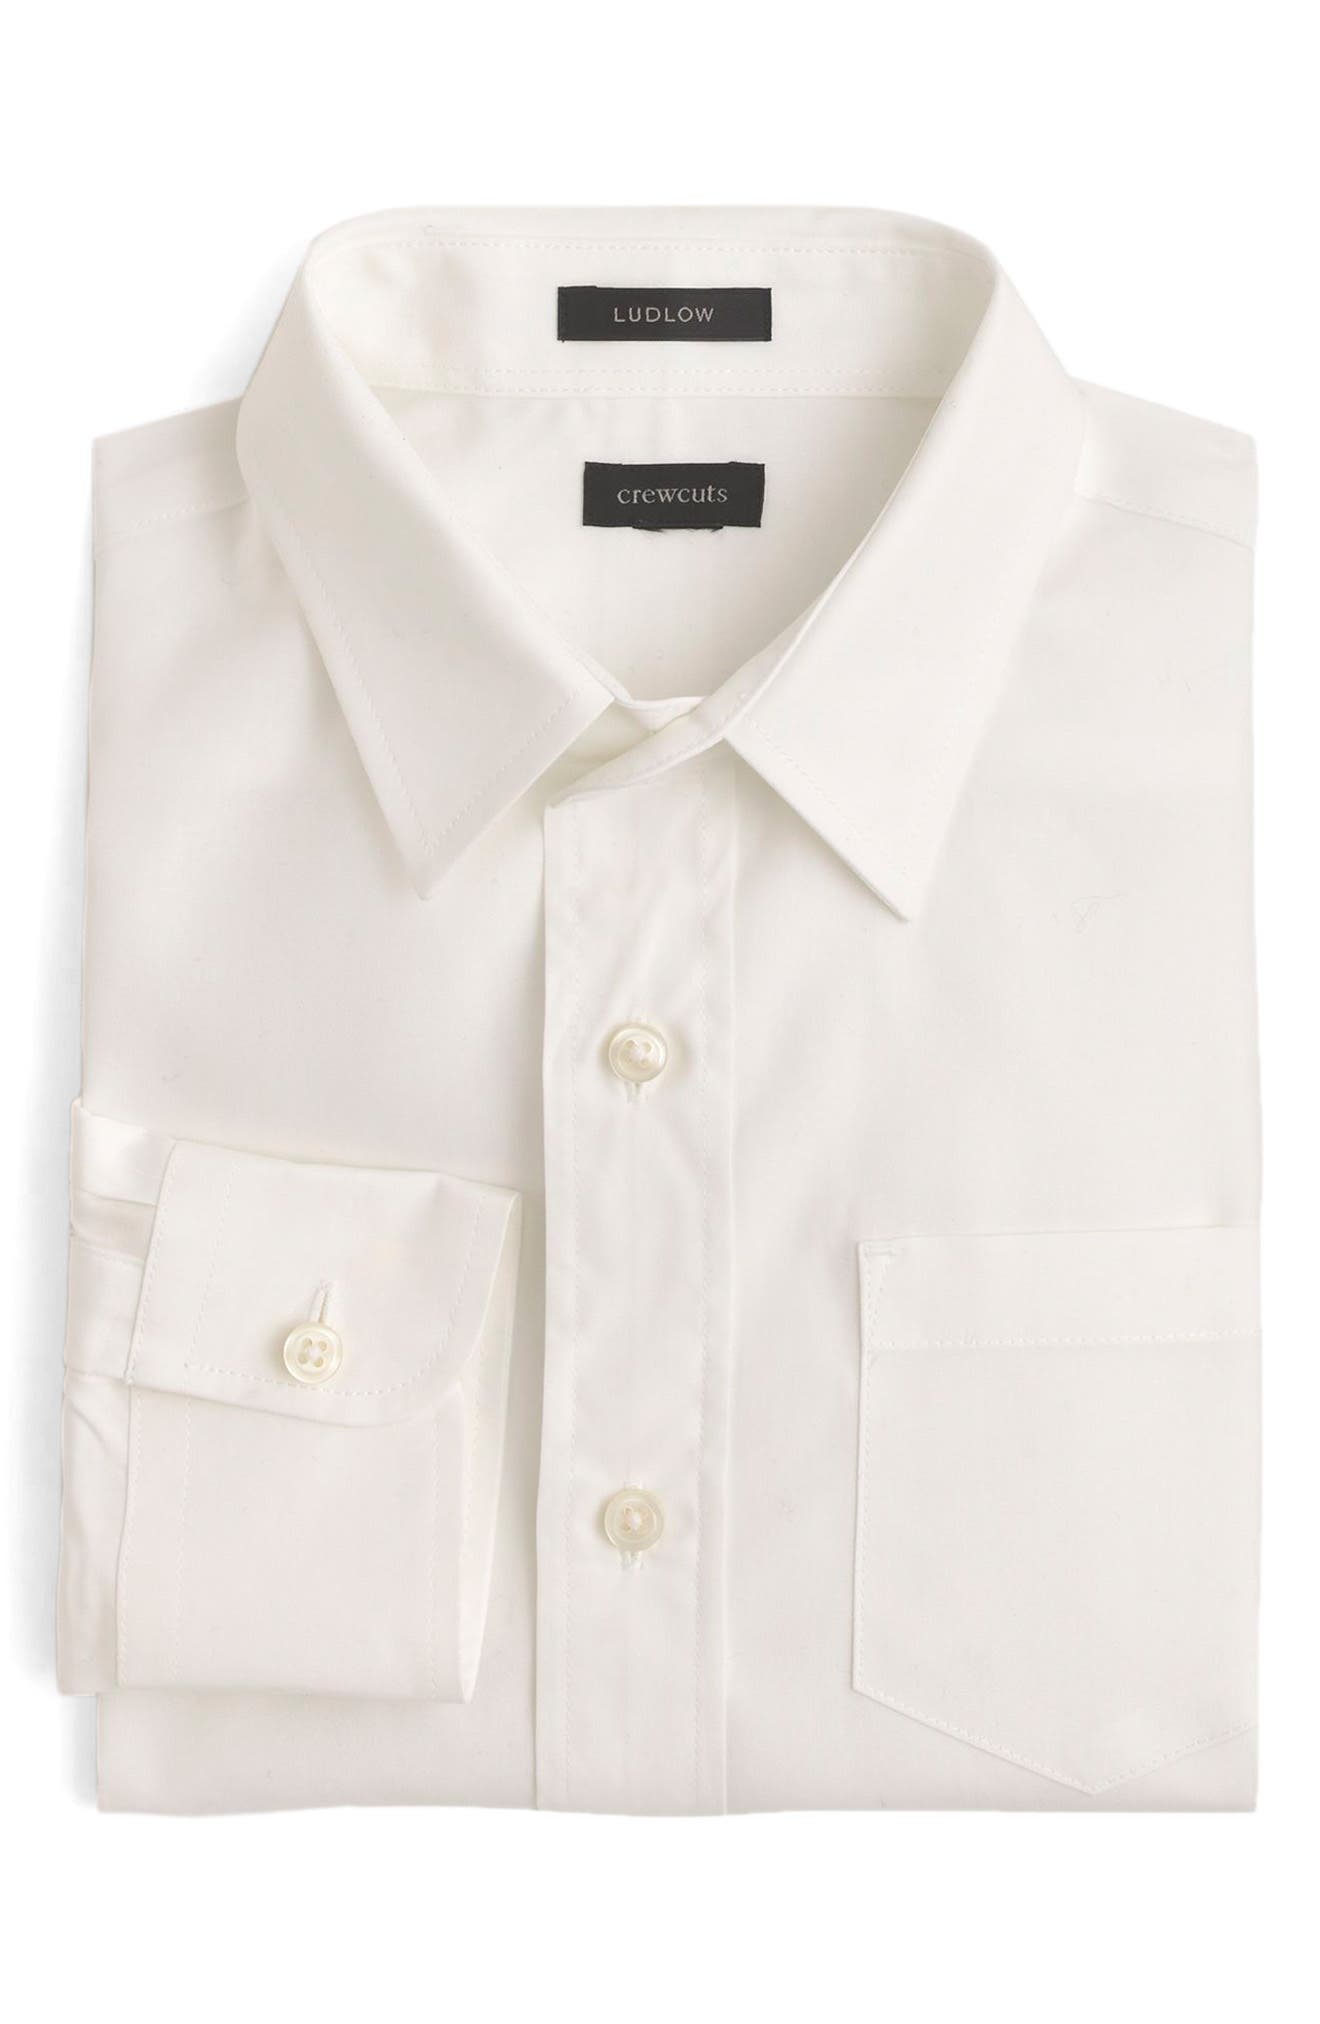 Ludlow Dress Shirt,                         Main,                         color, White Wt0002